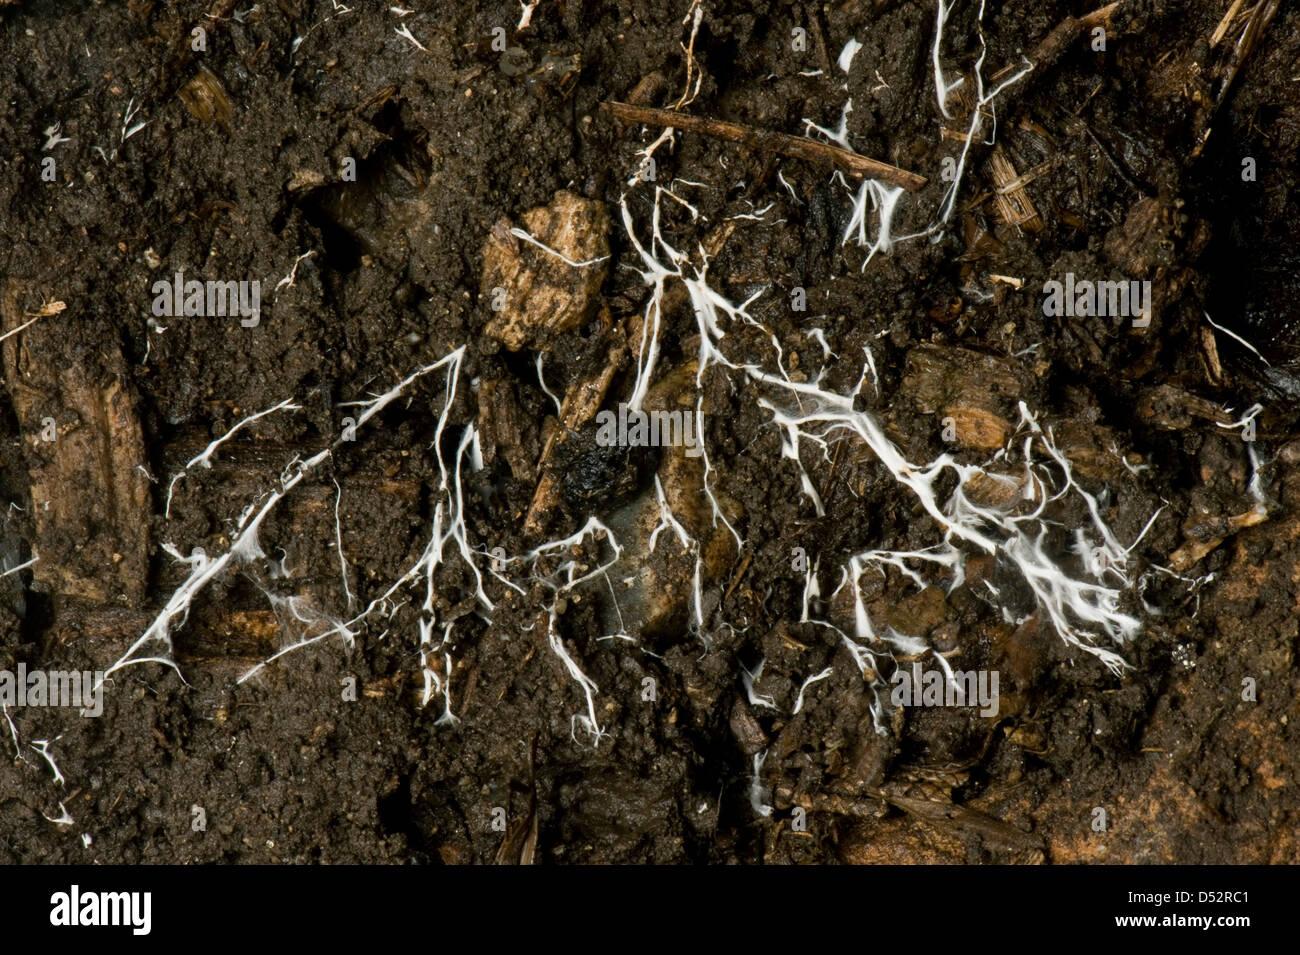 Branching threads of fungus mycelium in organic soil - Stock Image